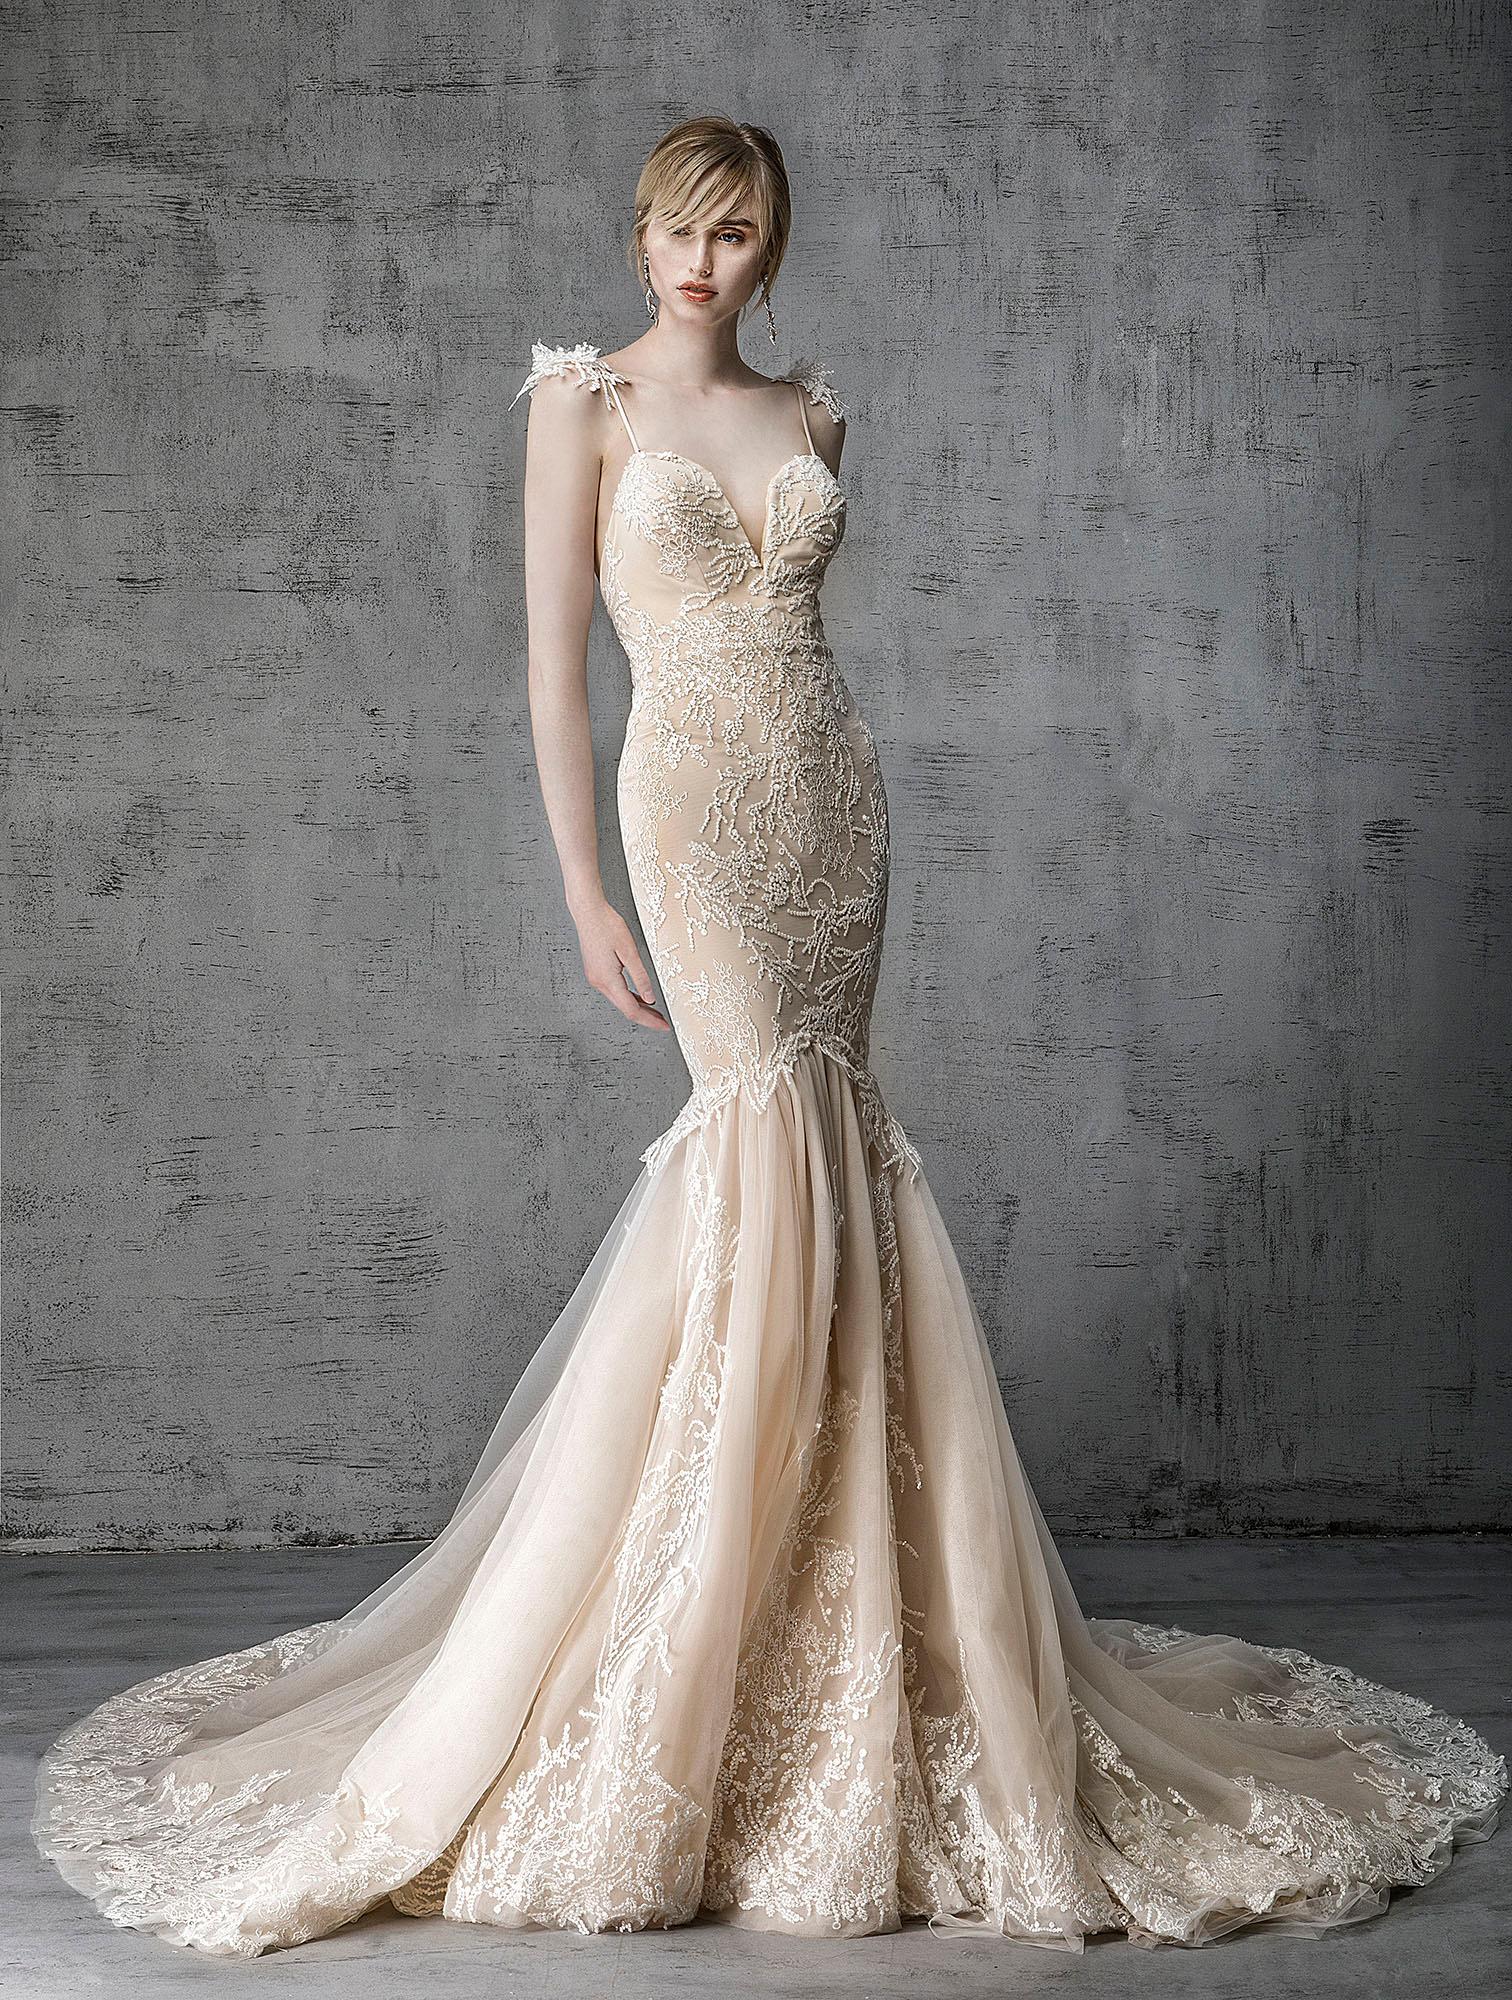 victoria kyriakides wedding dress spring 2019 champagne spaghetti-strap shoulder detail